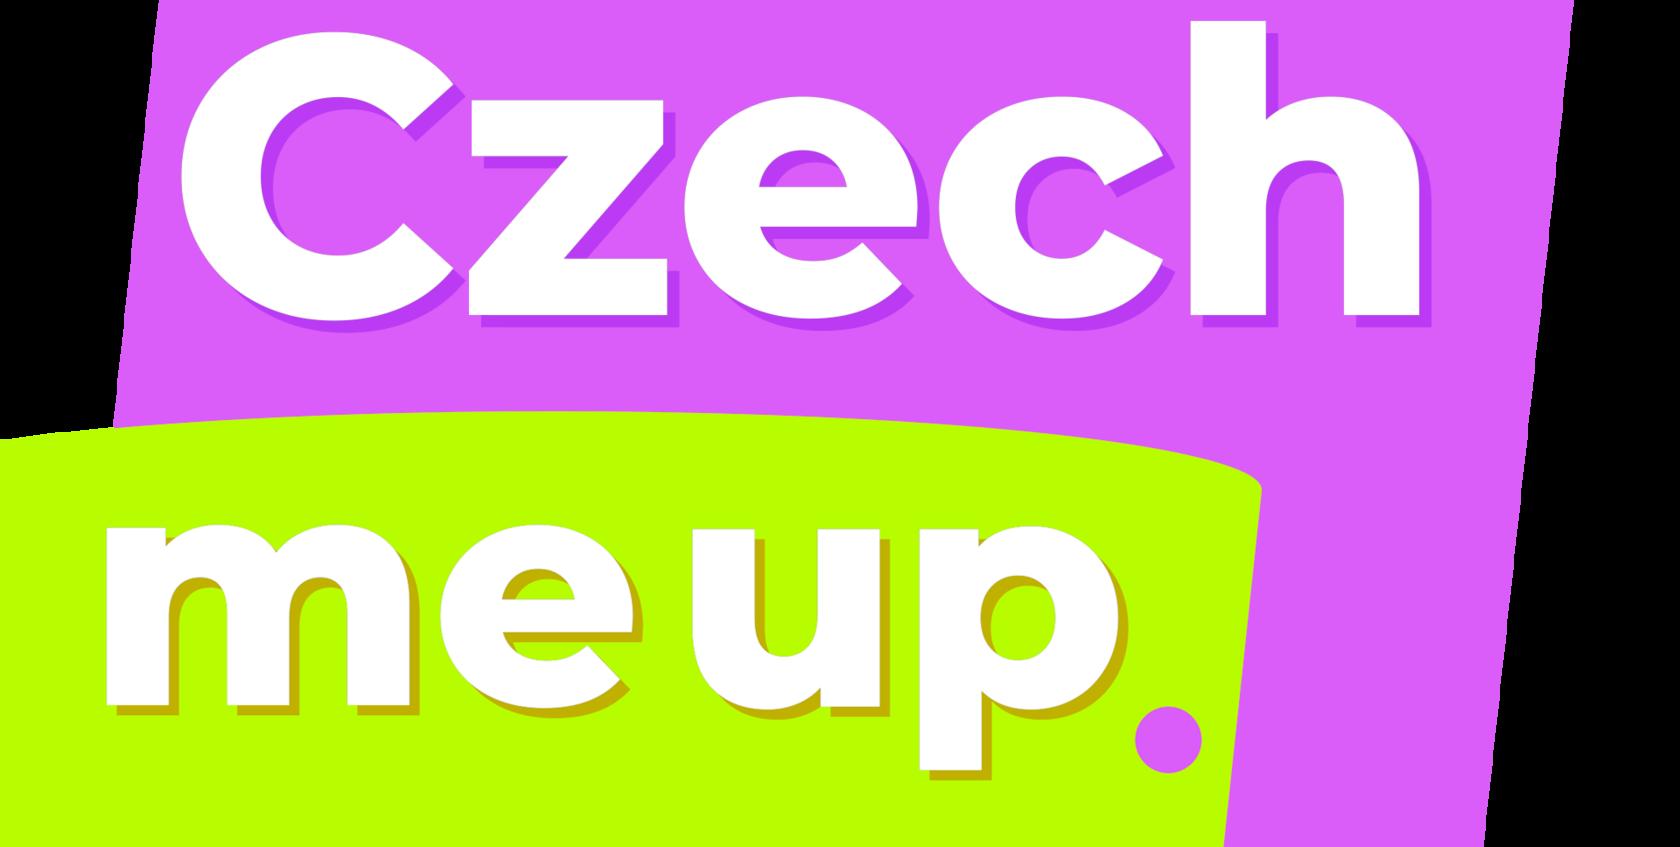 Логотип Czech me up